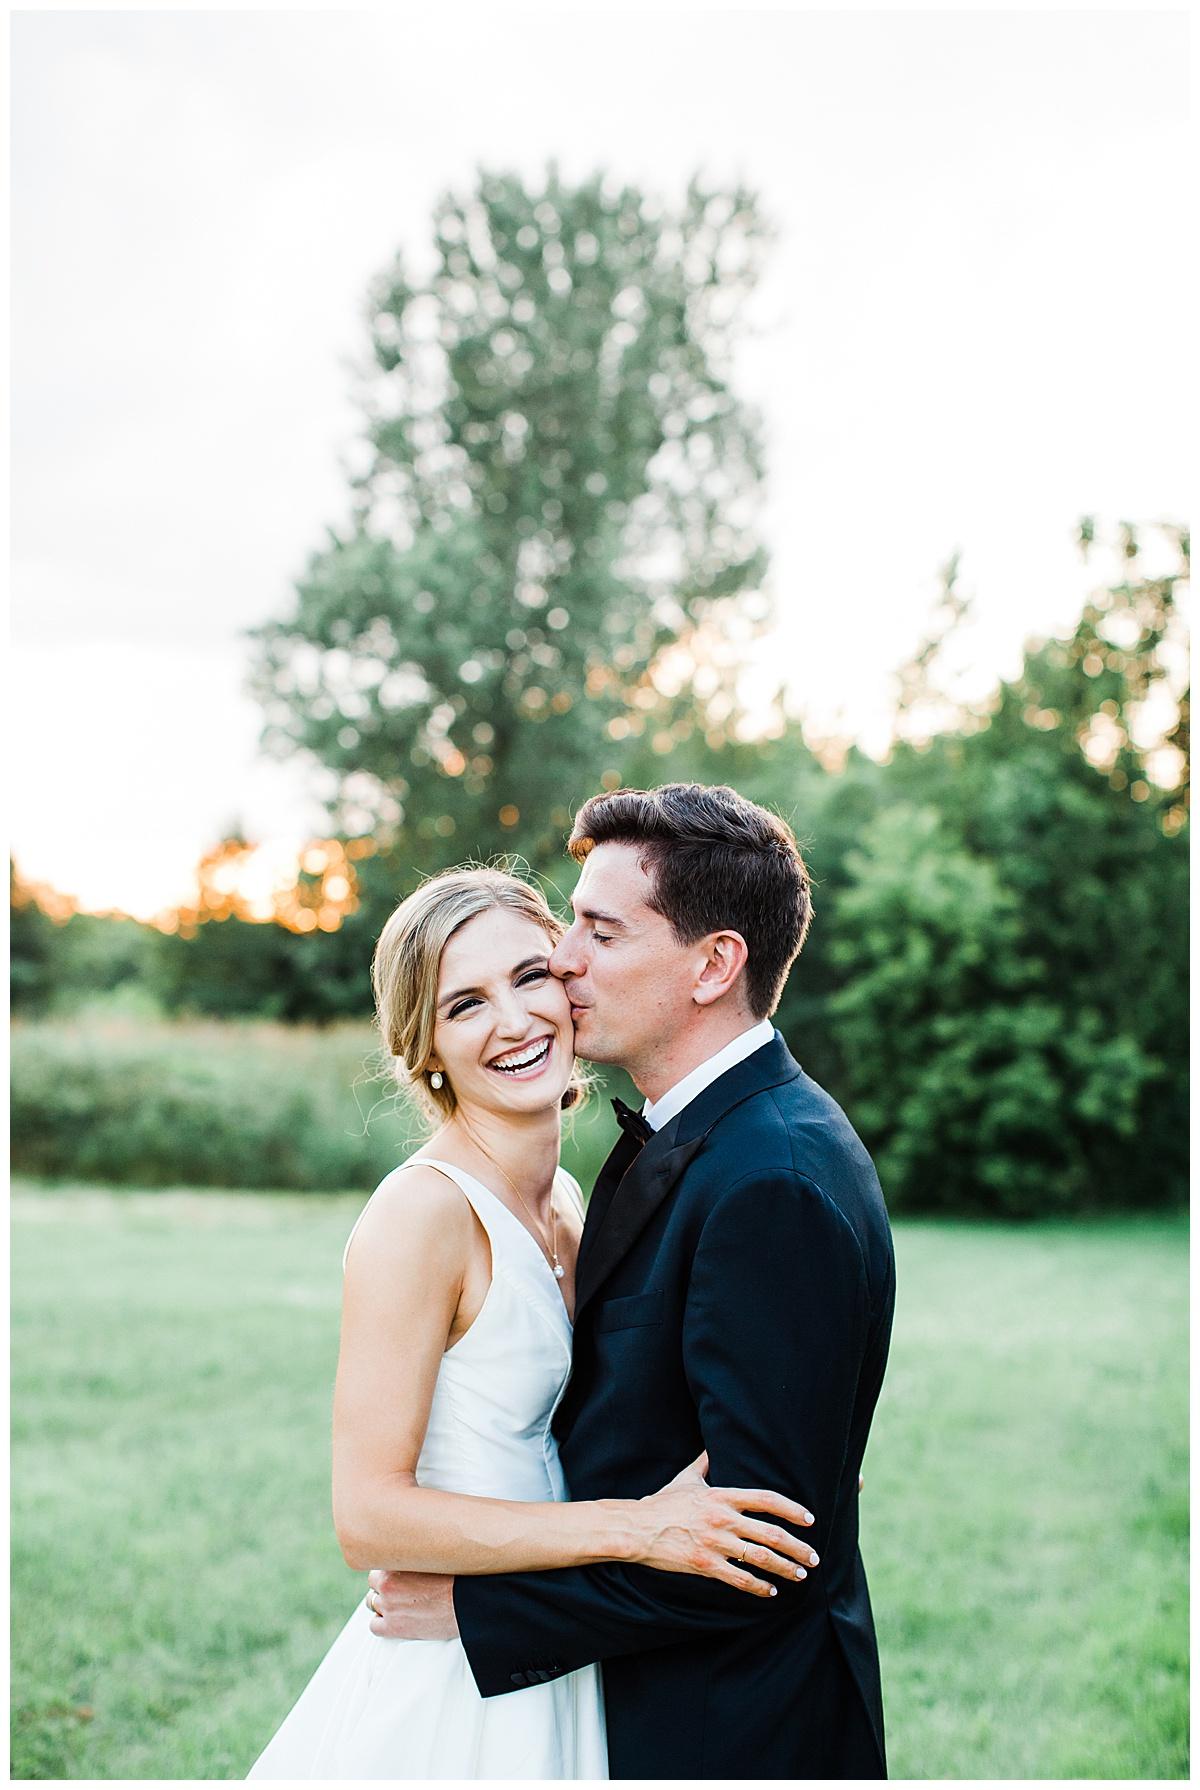 Groom kisses bride on cheek while she laughs| Georgetown, Ontario wedding photographer| Toronto wedding photographer| 3photography